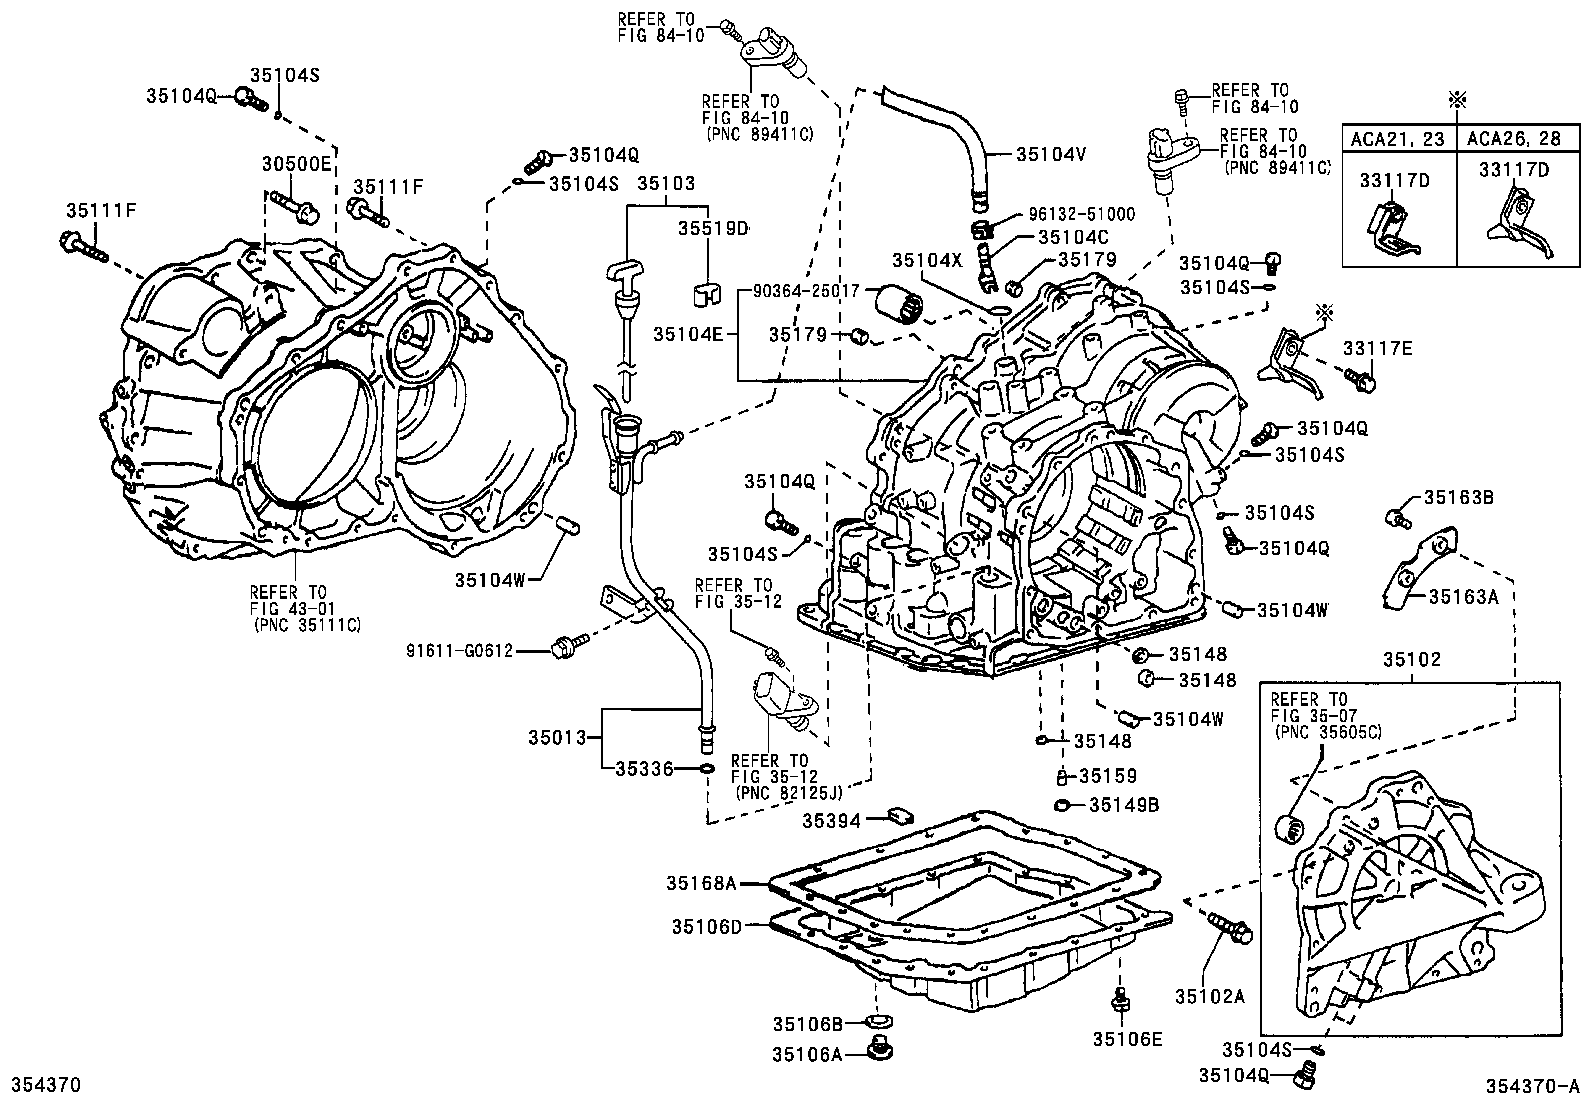 Rav4 2001 Obd2 Wiring Diagram